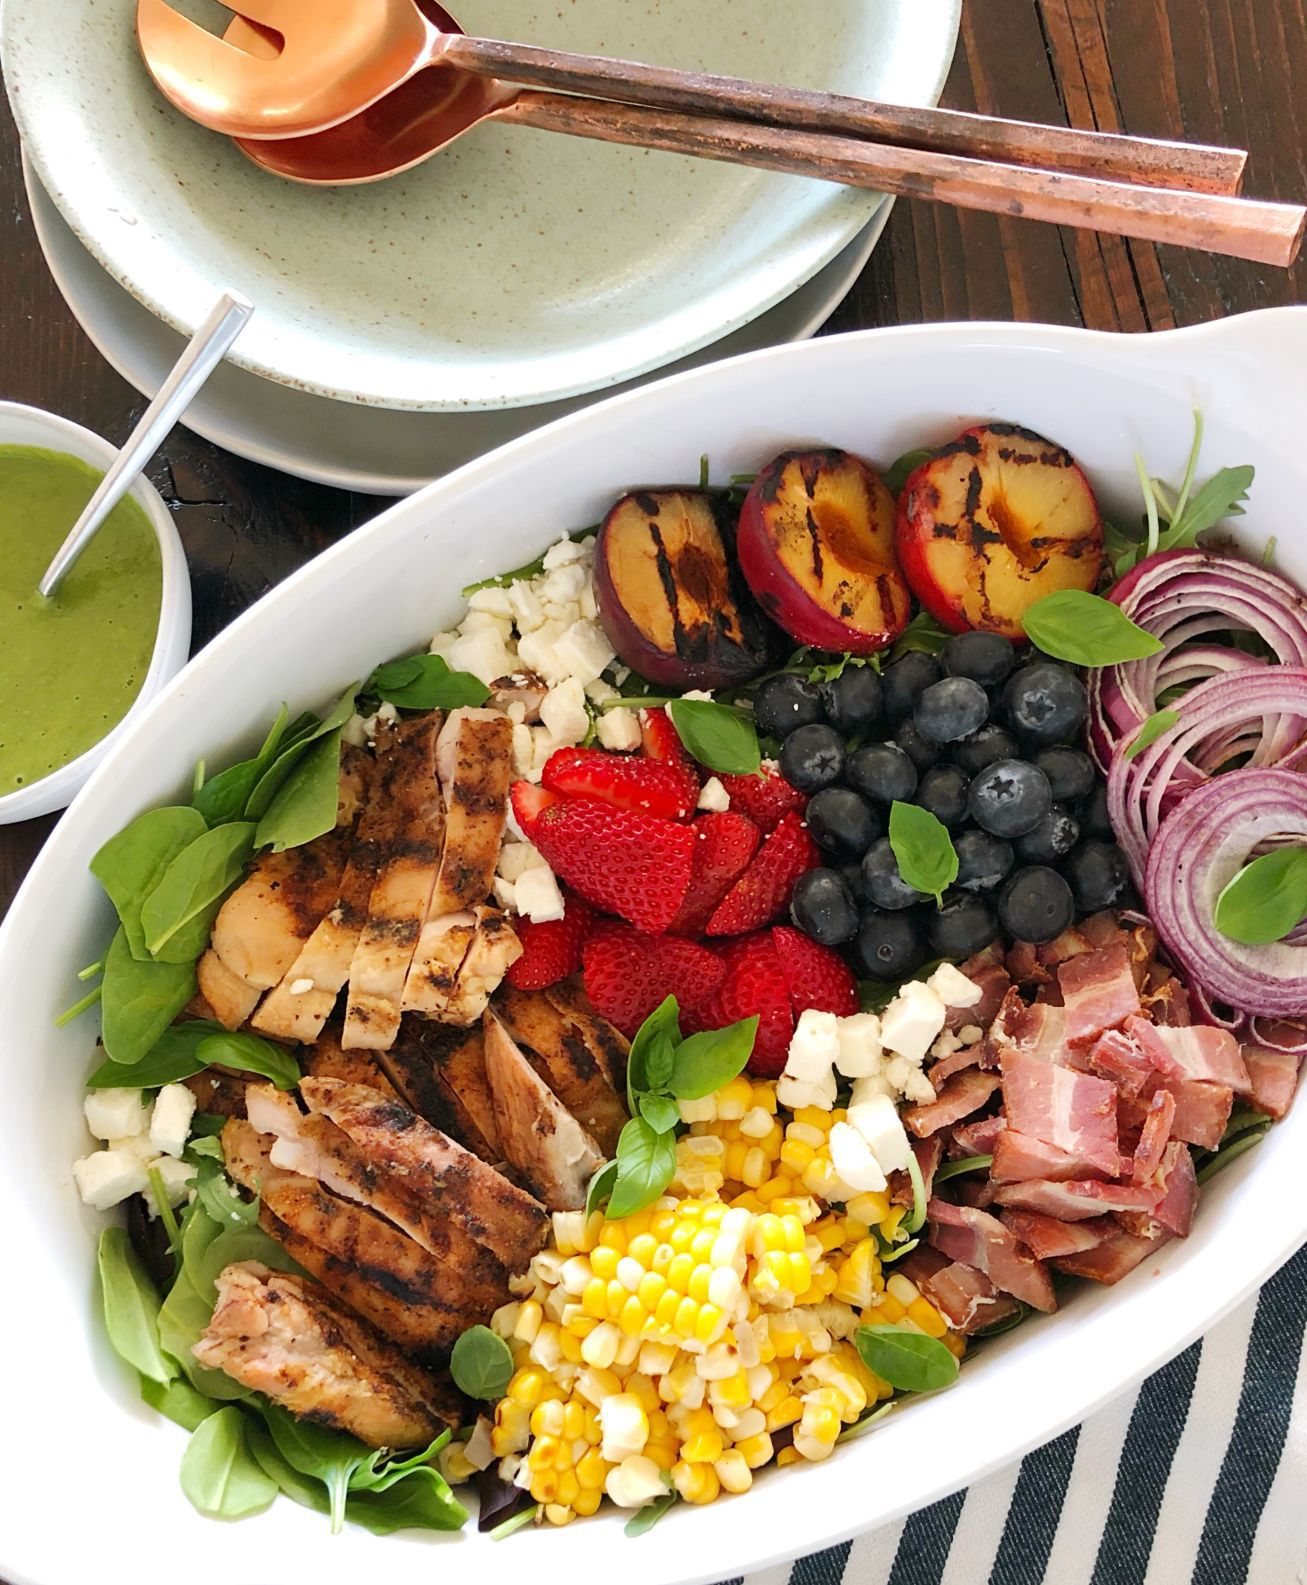 Kitchen Captivated: Grilled Summer Cobb Salad